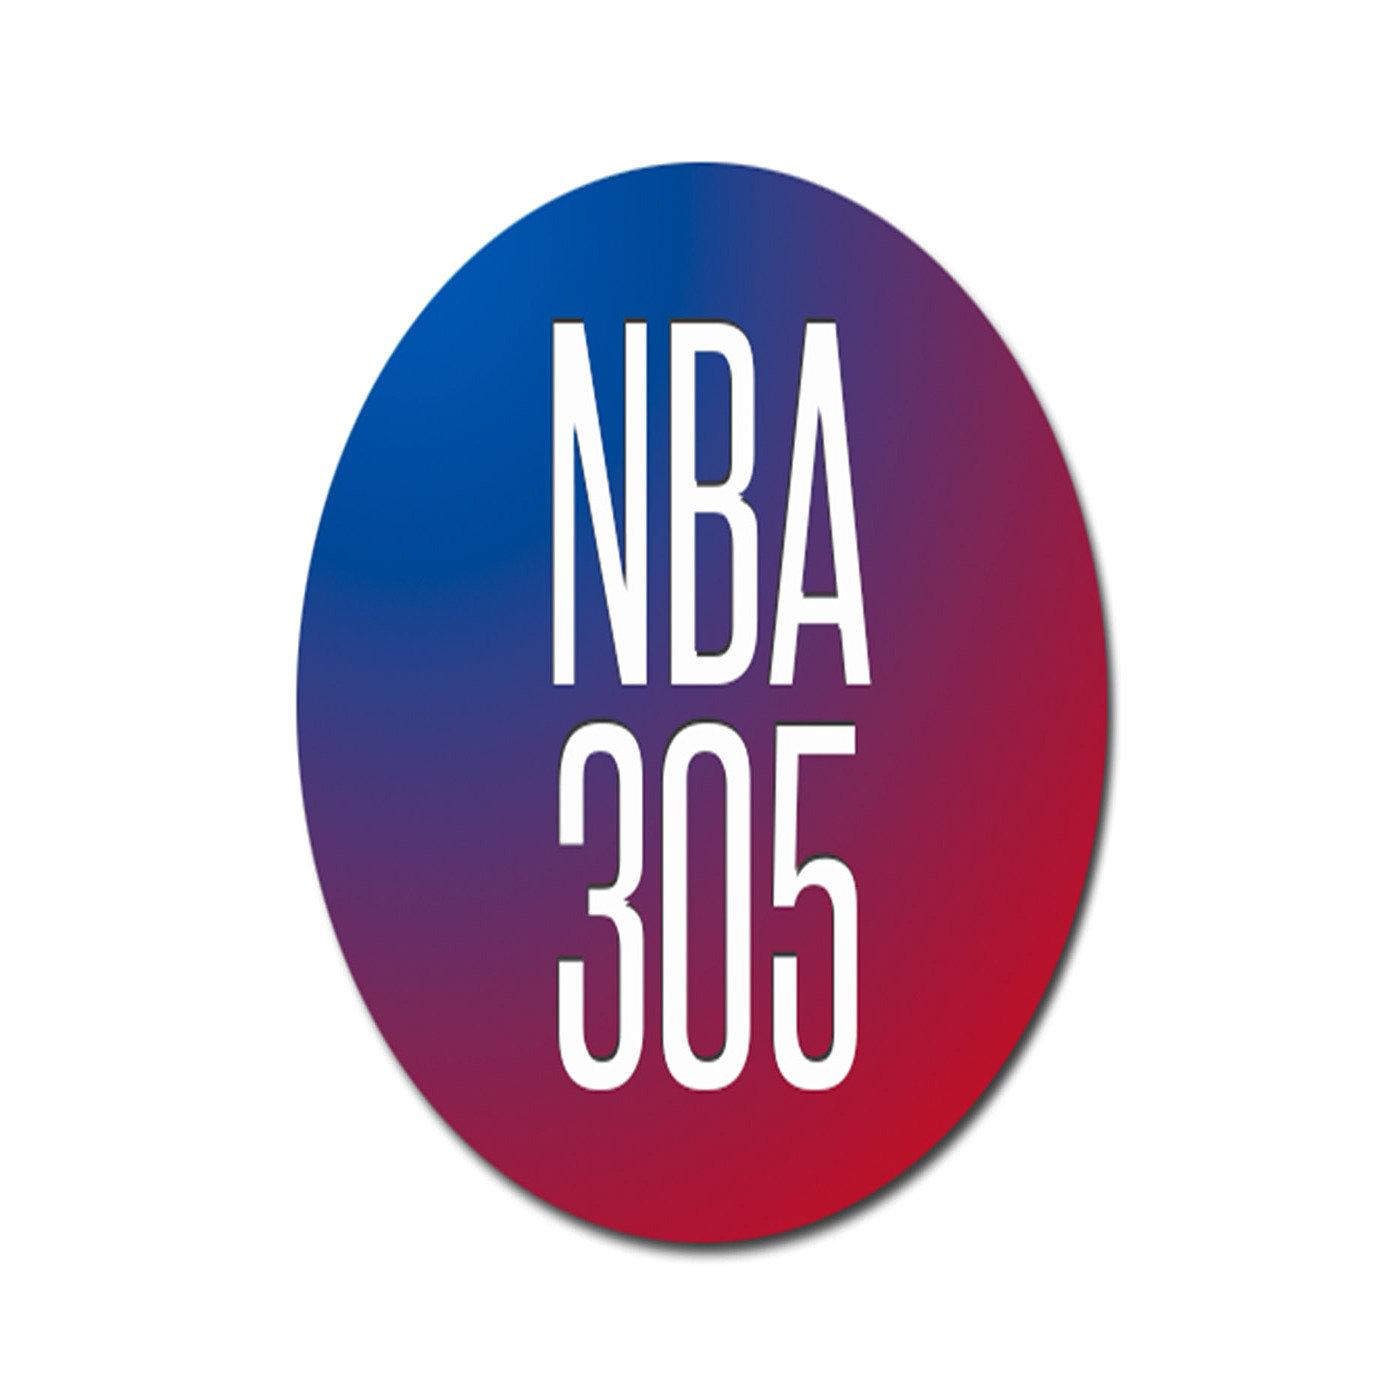 <![CDATA[NBA305]]>